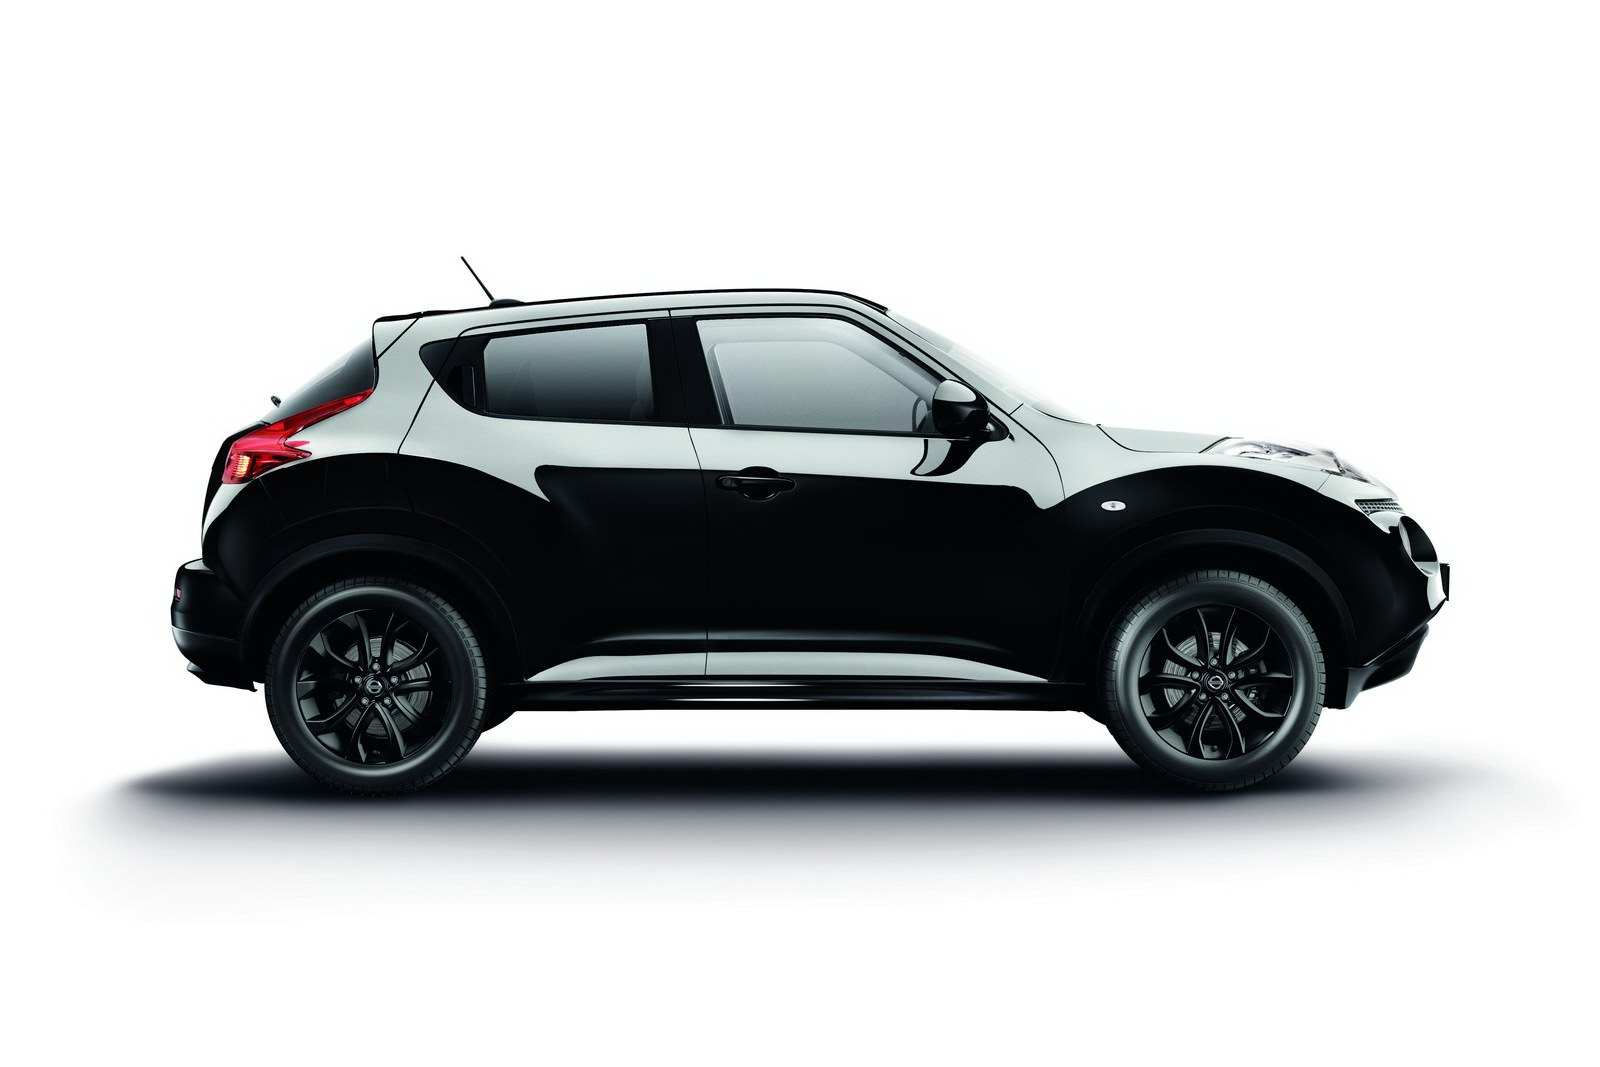 kuro a new version of nissan juke 2013 car. Black Bedroom Furniture Sets. Home Design Ideas